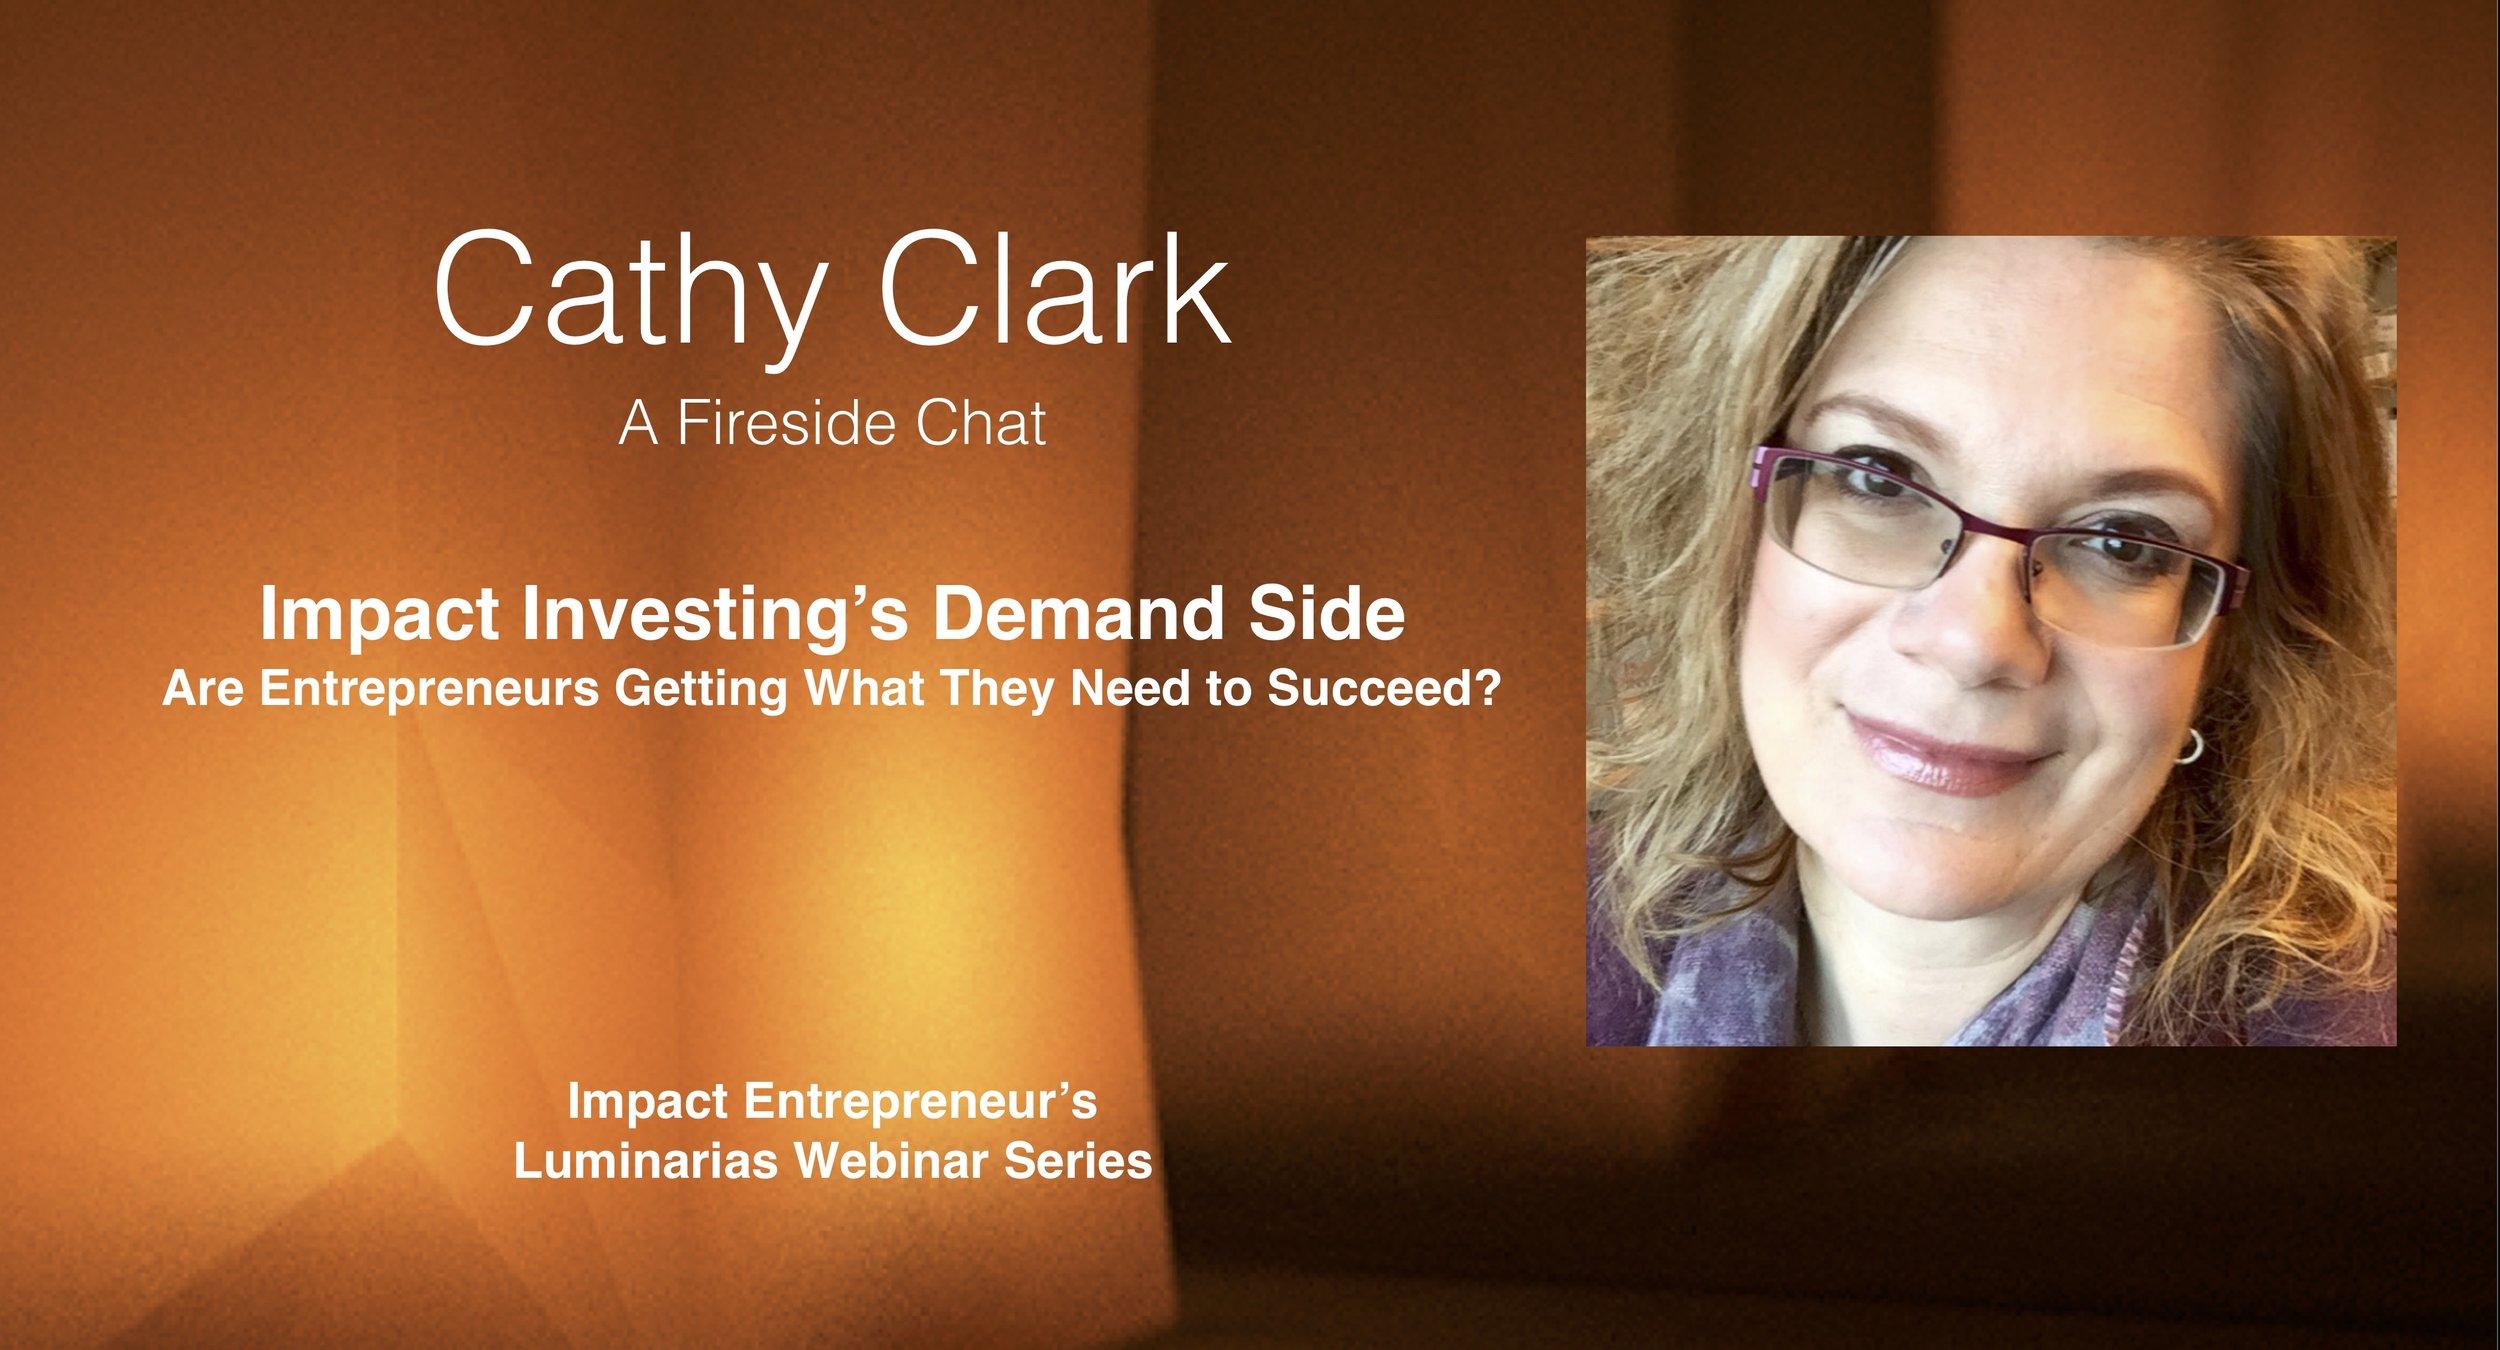 Cathy Clark Lead Image.jpg